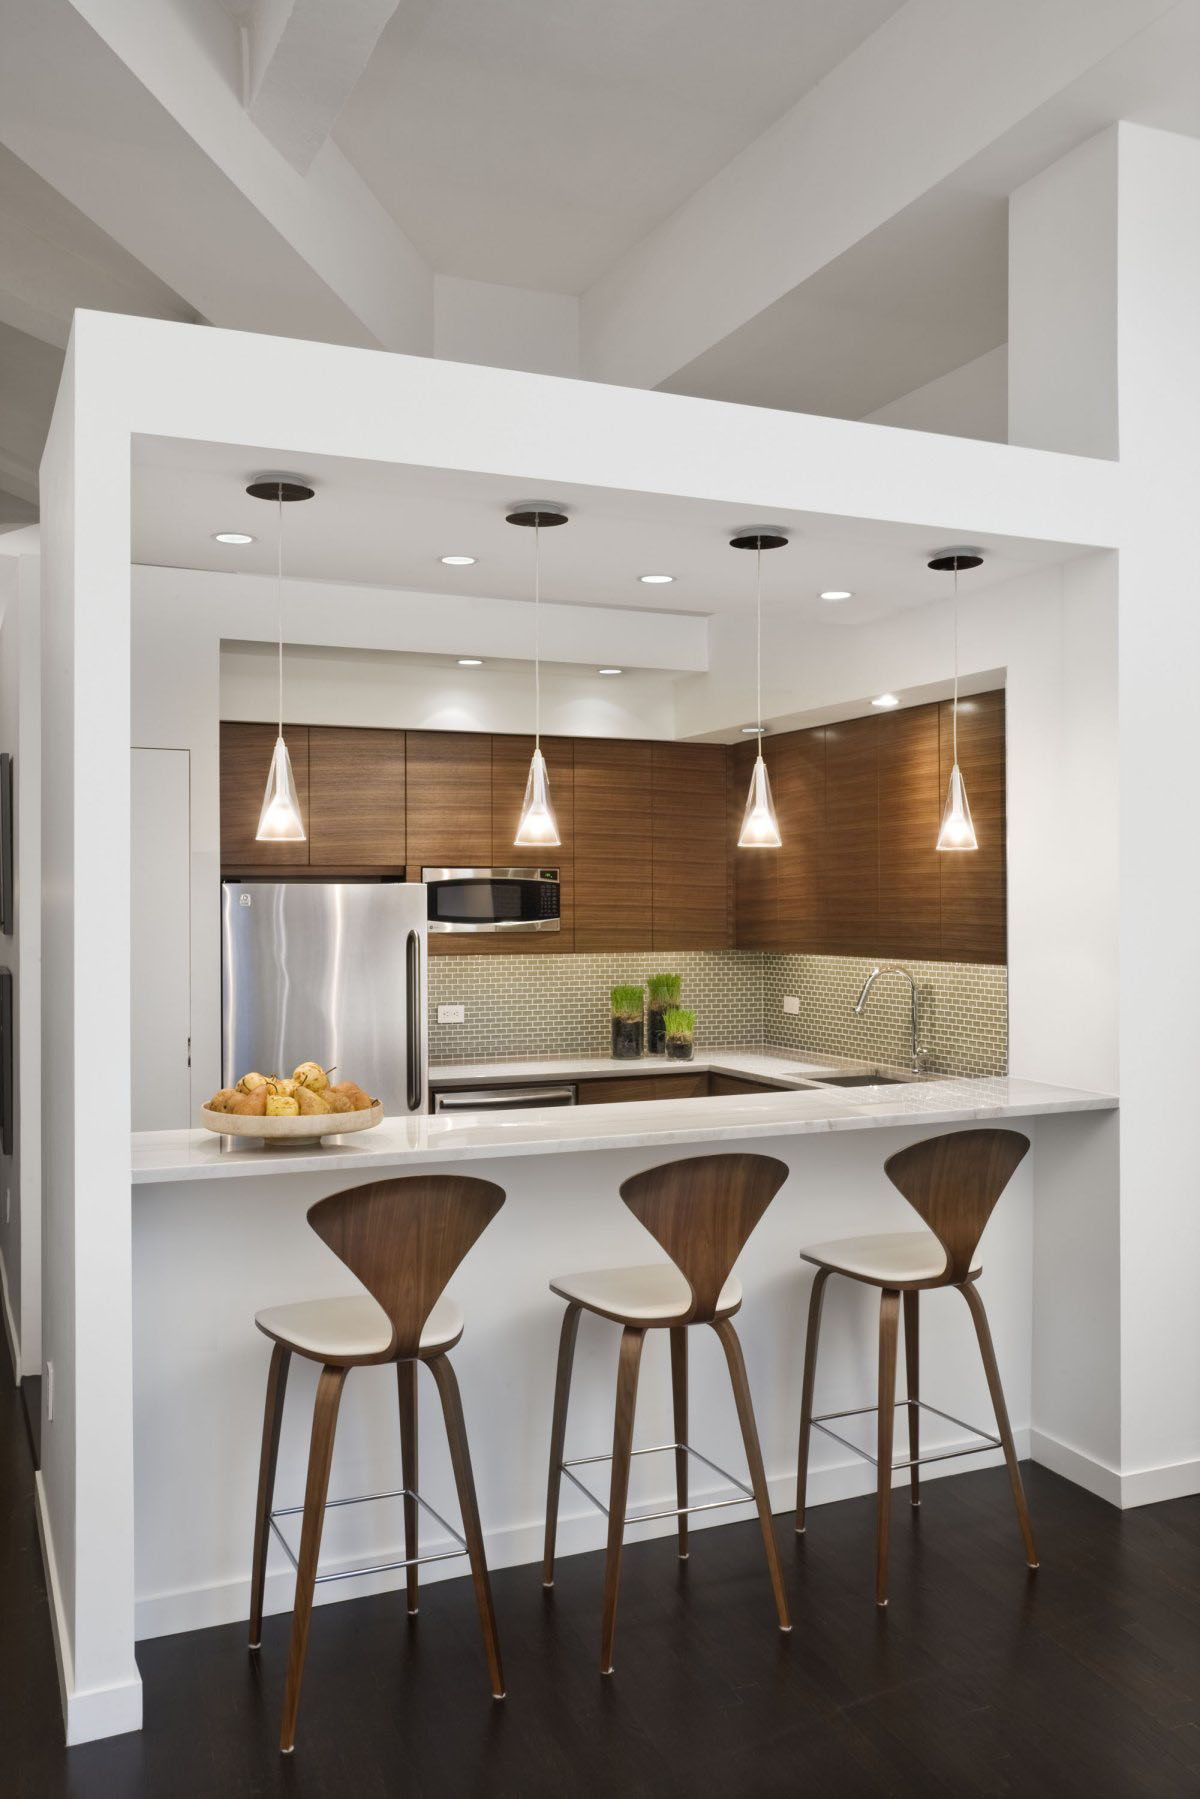 Apartments Small Modern Apartment Kitchensmall Unique Studio